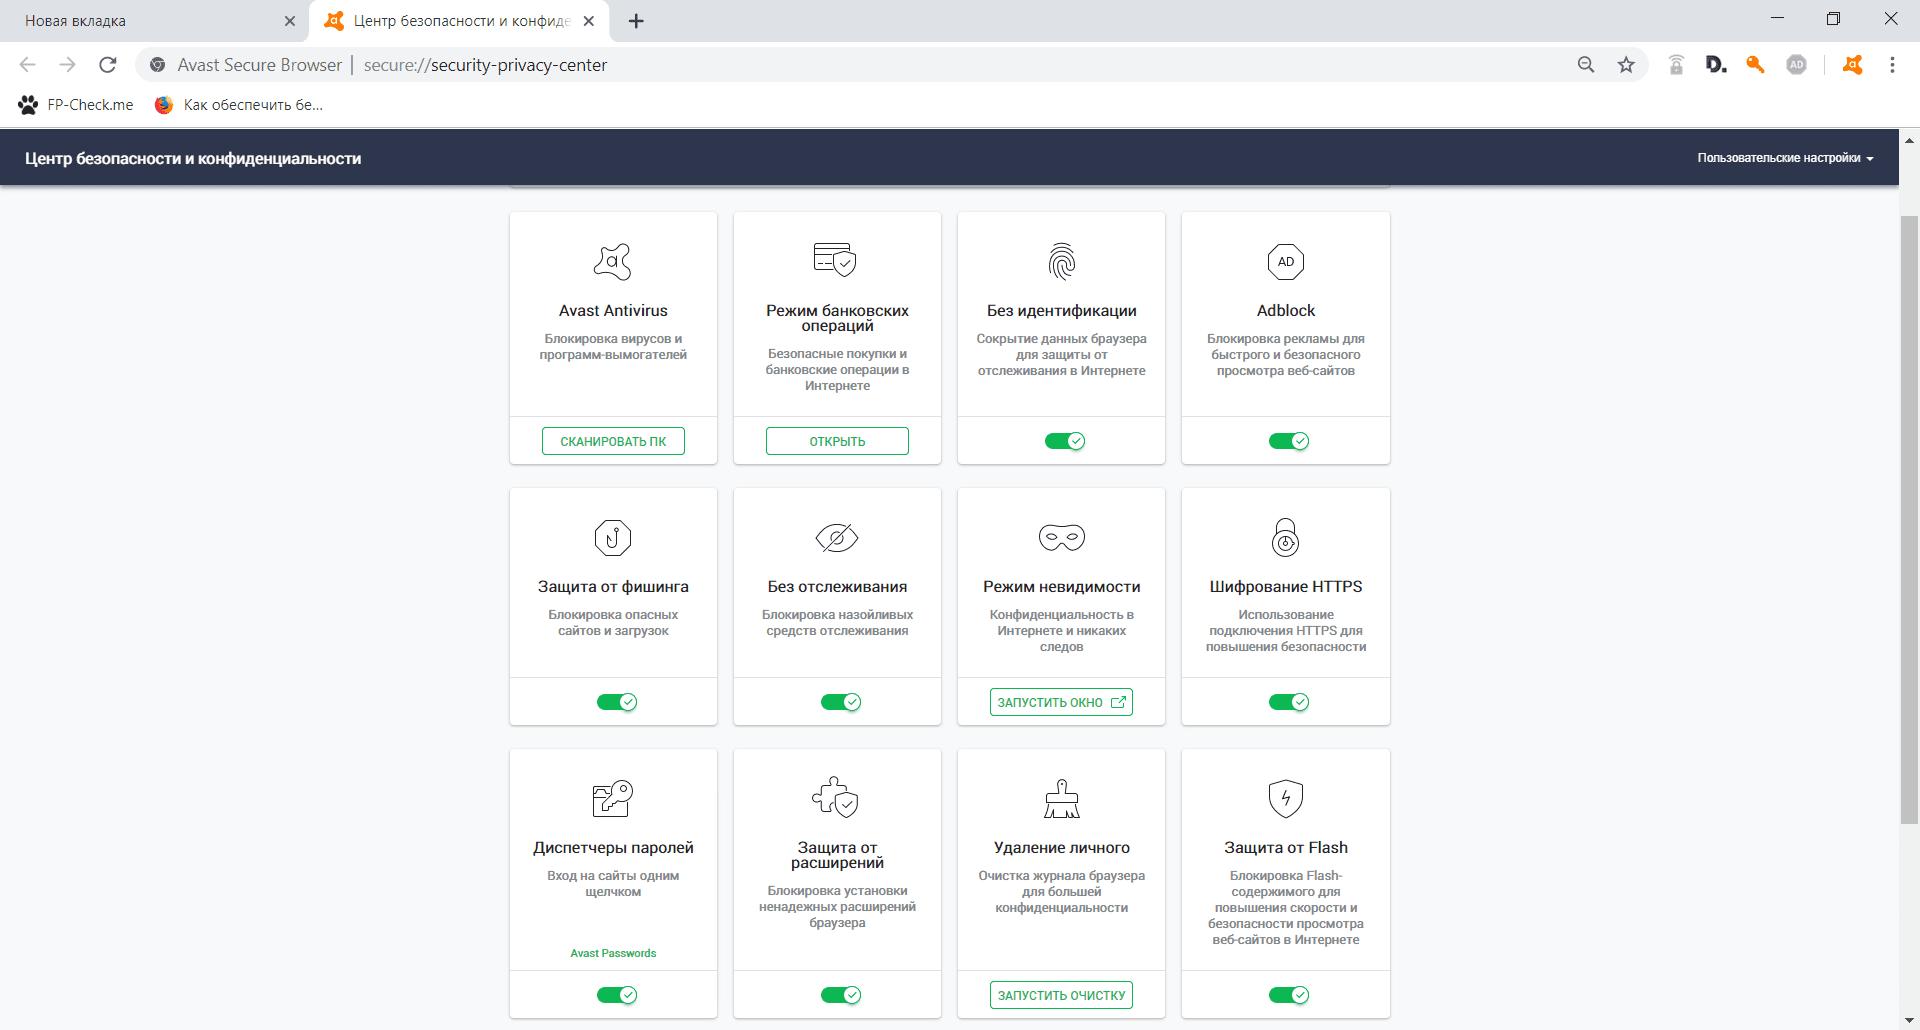 Центр безопасности и конфиденциальности Avast Secure Browser